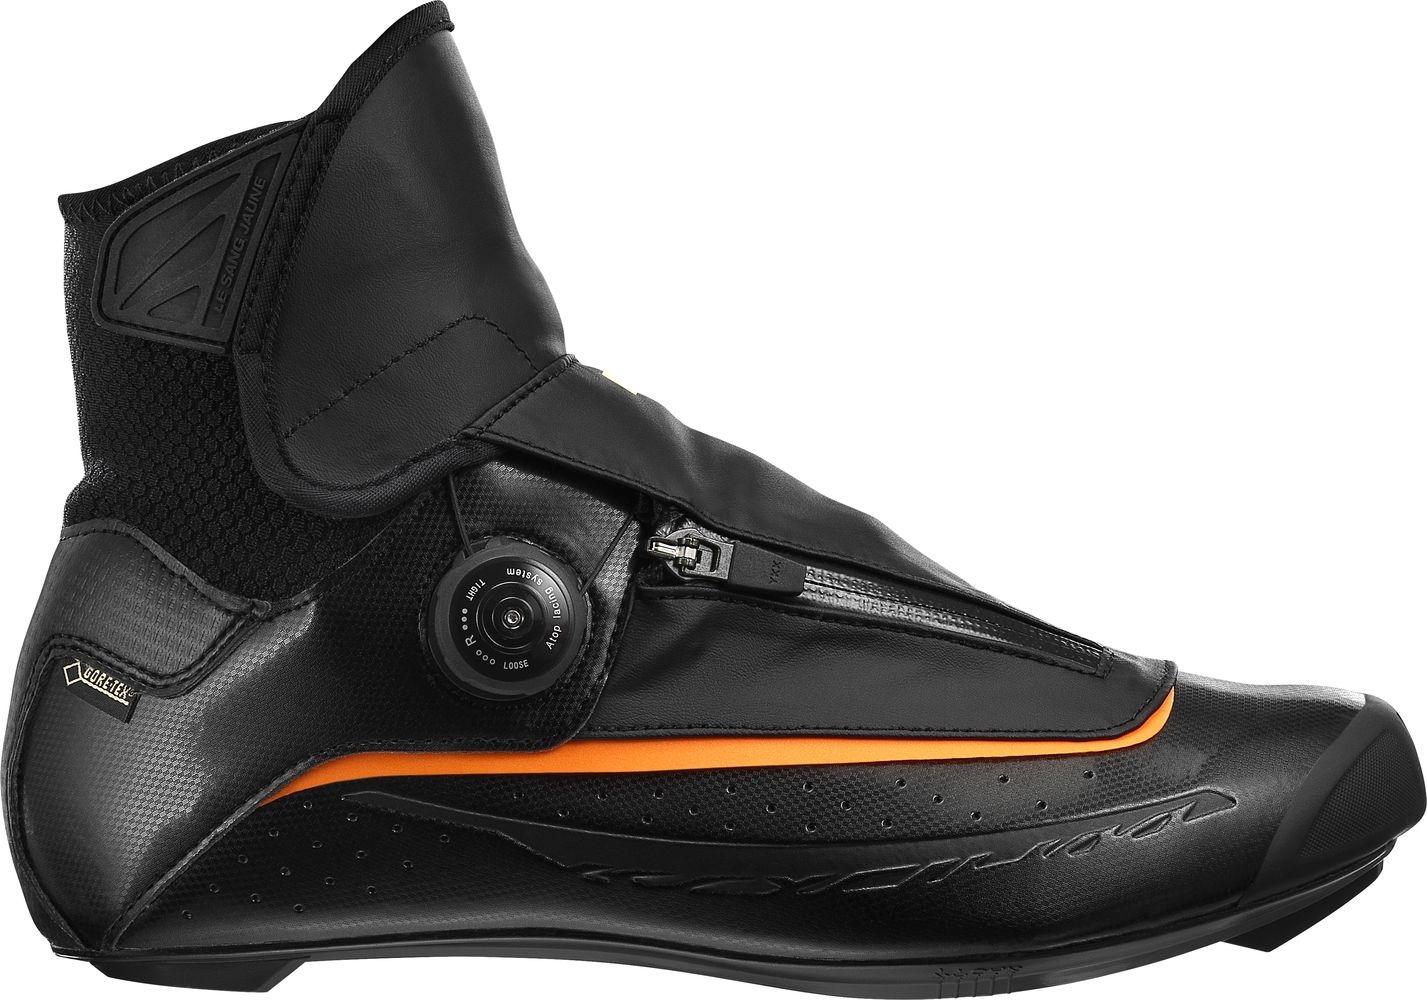 Chaussures hiver Mavic Ksyrium Pro Thermo Noir - 43 1/3